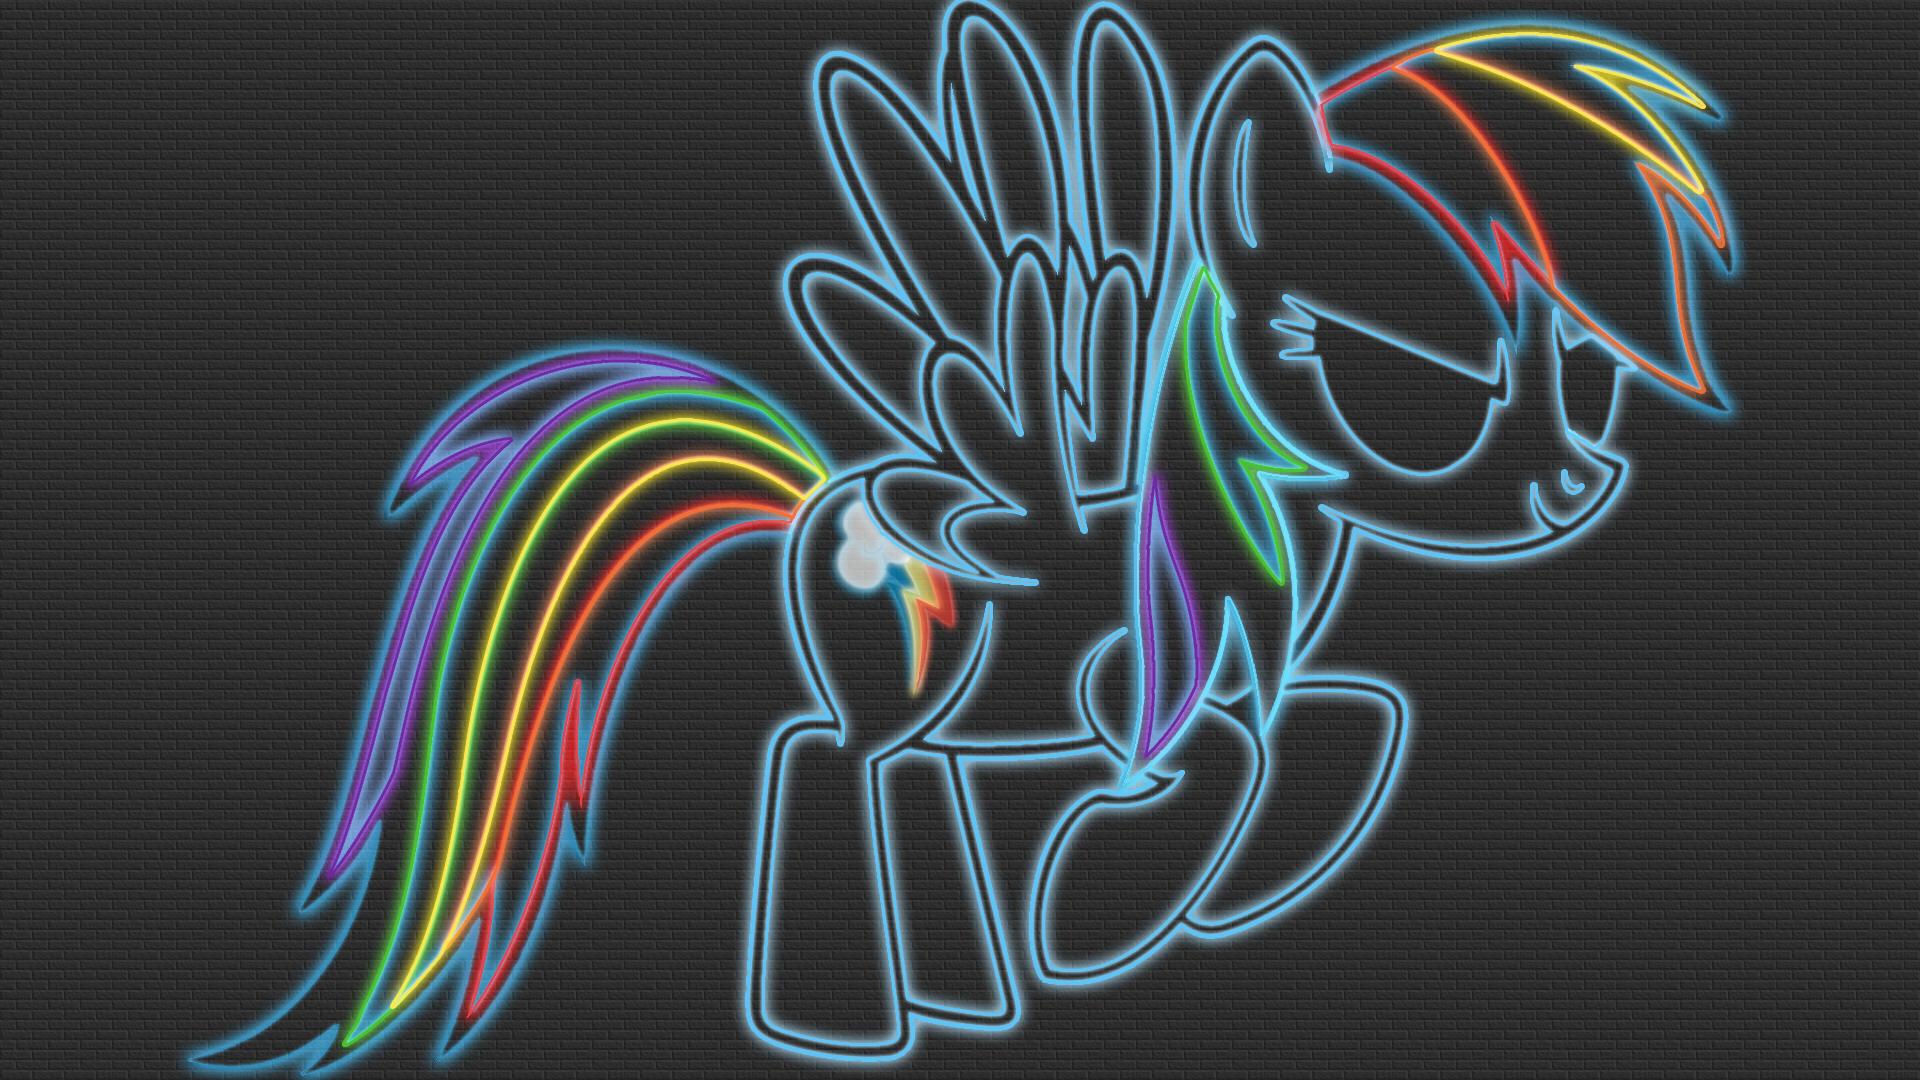 Rainbow Dash Neon-Glow Wallpaper by GT4tube on DeviantArt